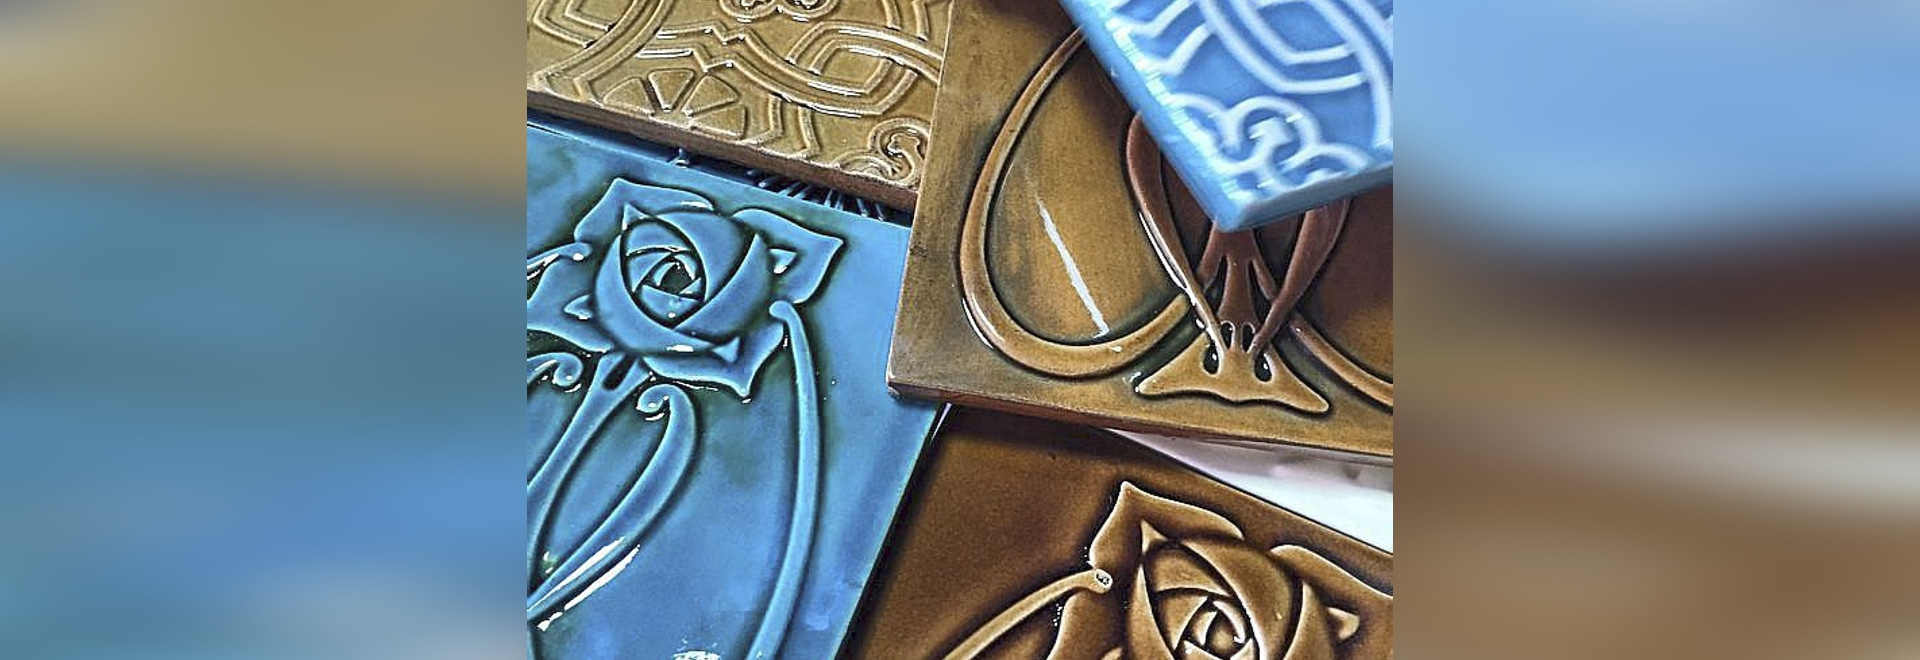 Karoistanbul Hand-Painted Ceramic Tiles